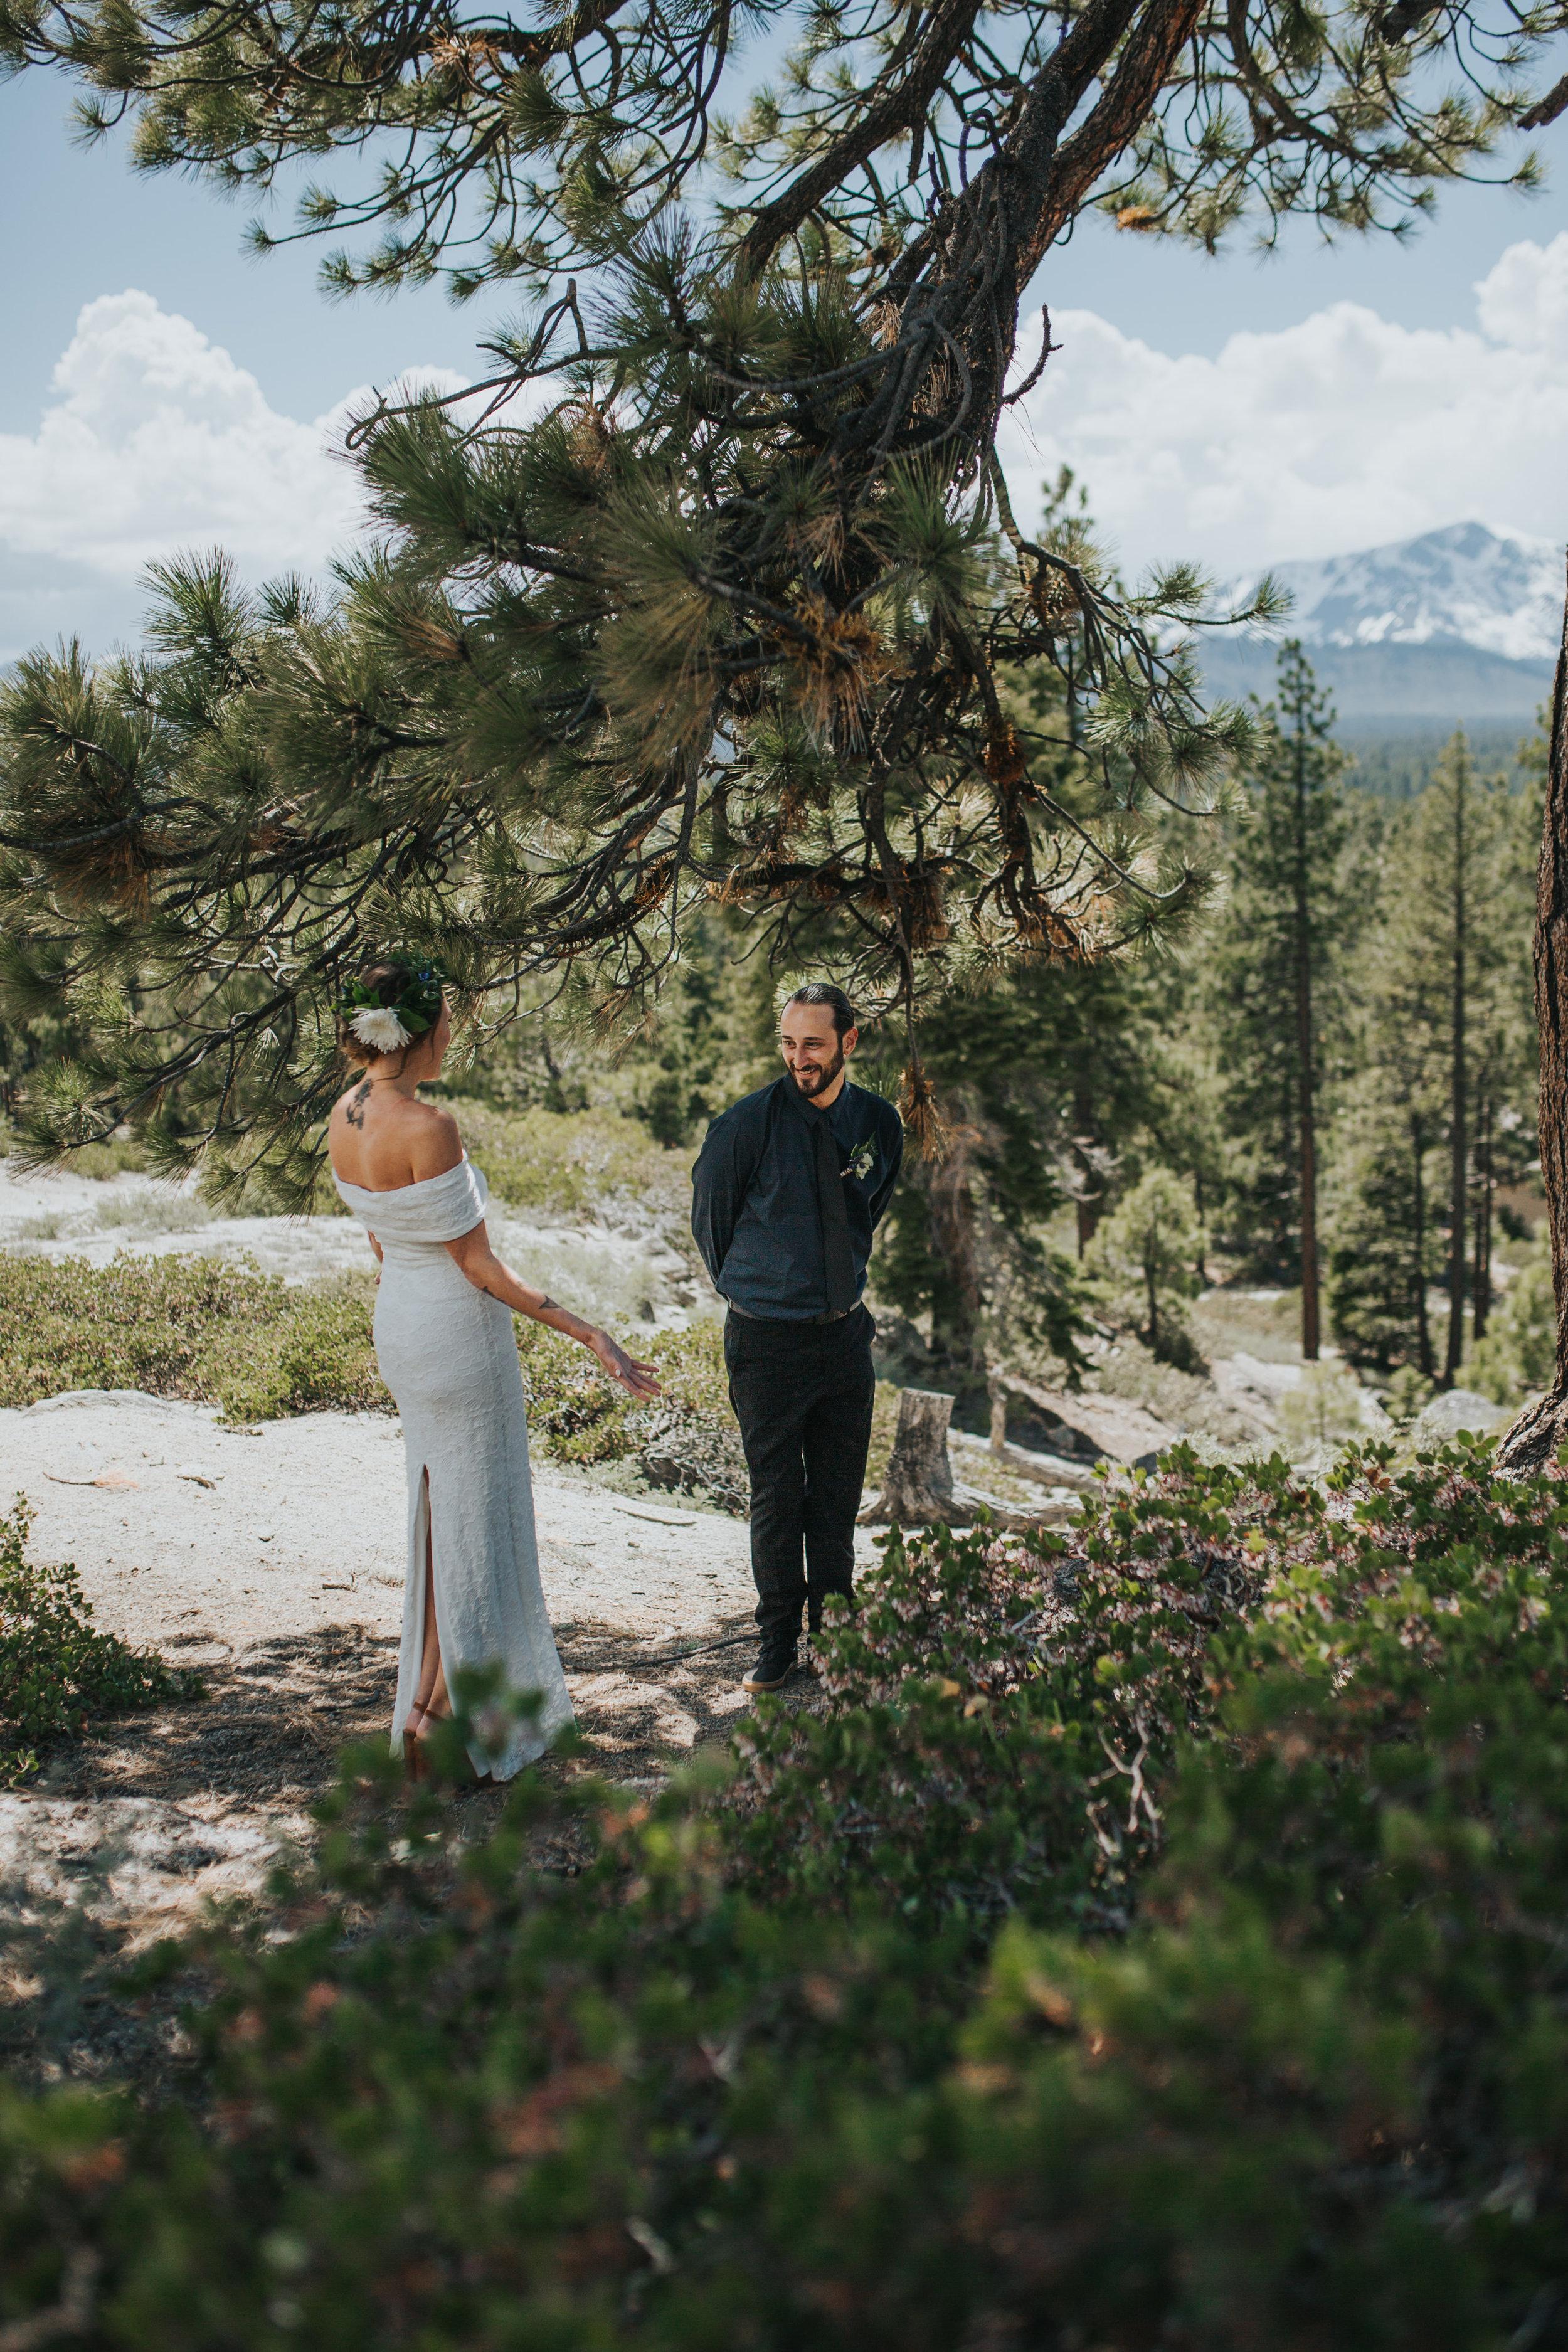 south-lake-tahoe-elopement-valerie-lendvay-photo-007.jpg